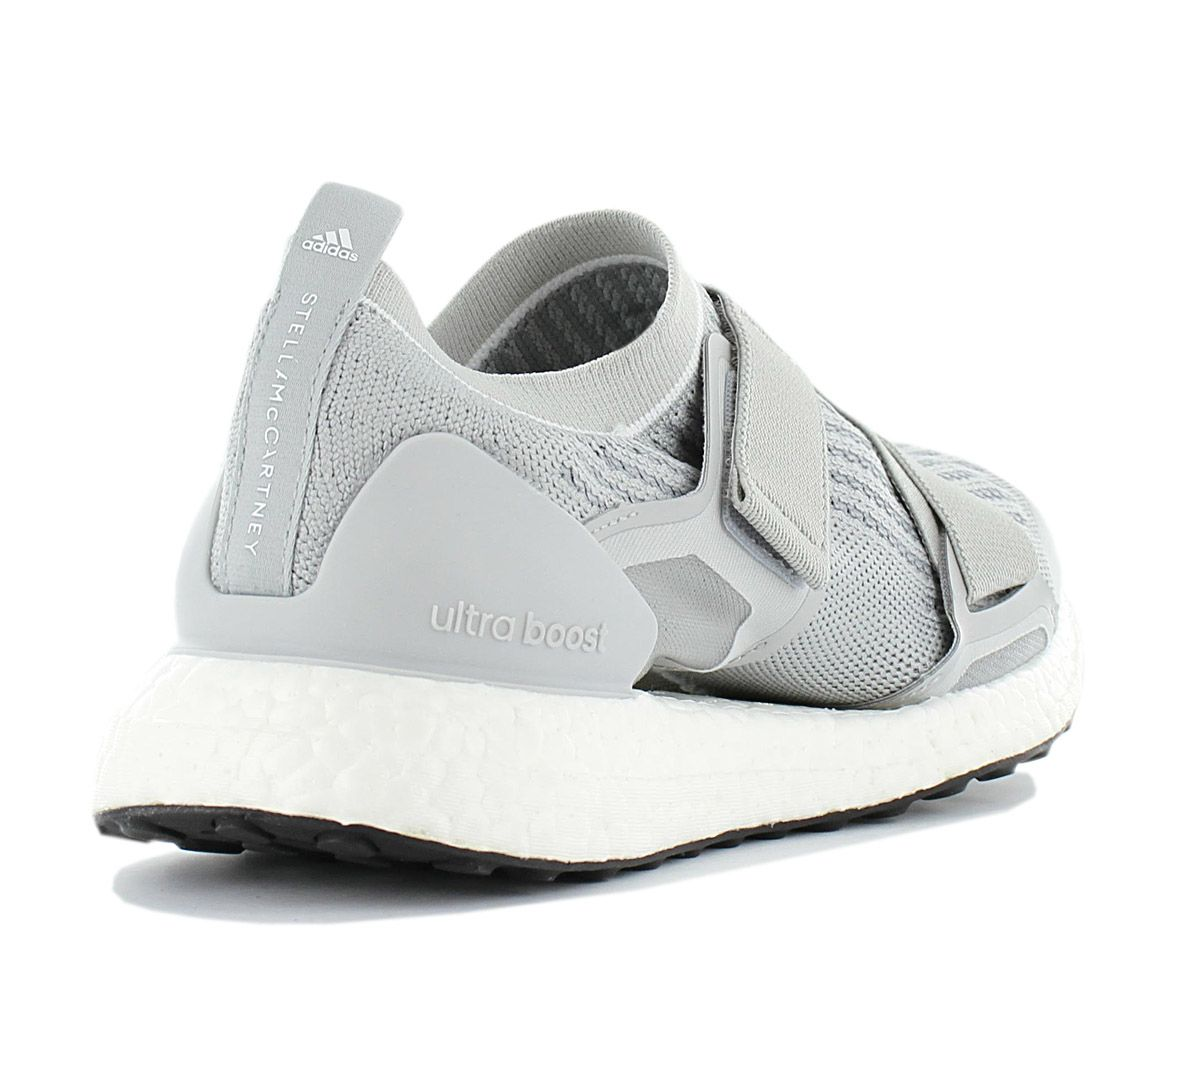 Details zu adidas by Stella McCartney x Ultra Boost X S Damen Sneaker AC7551 Sportschuh NEU